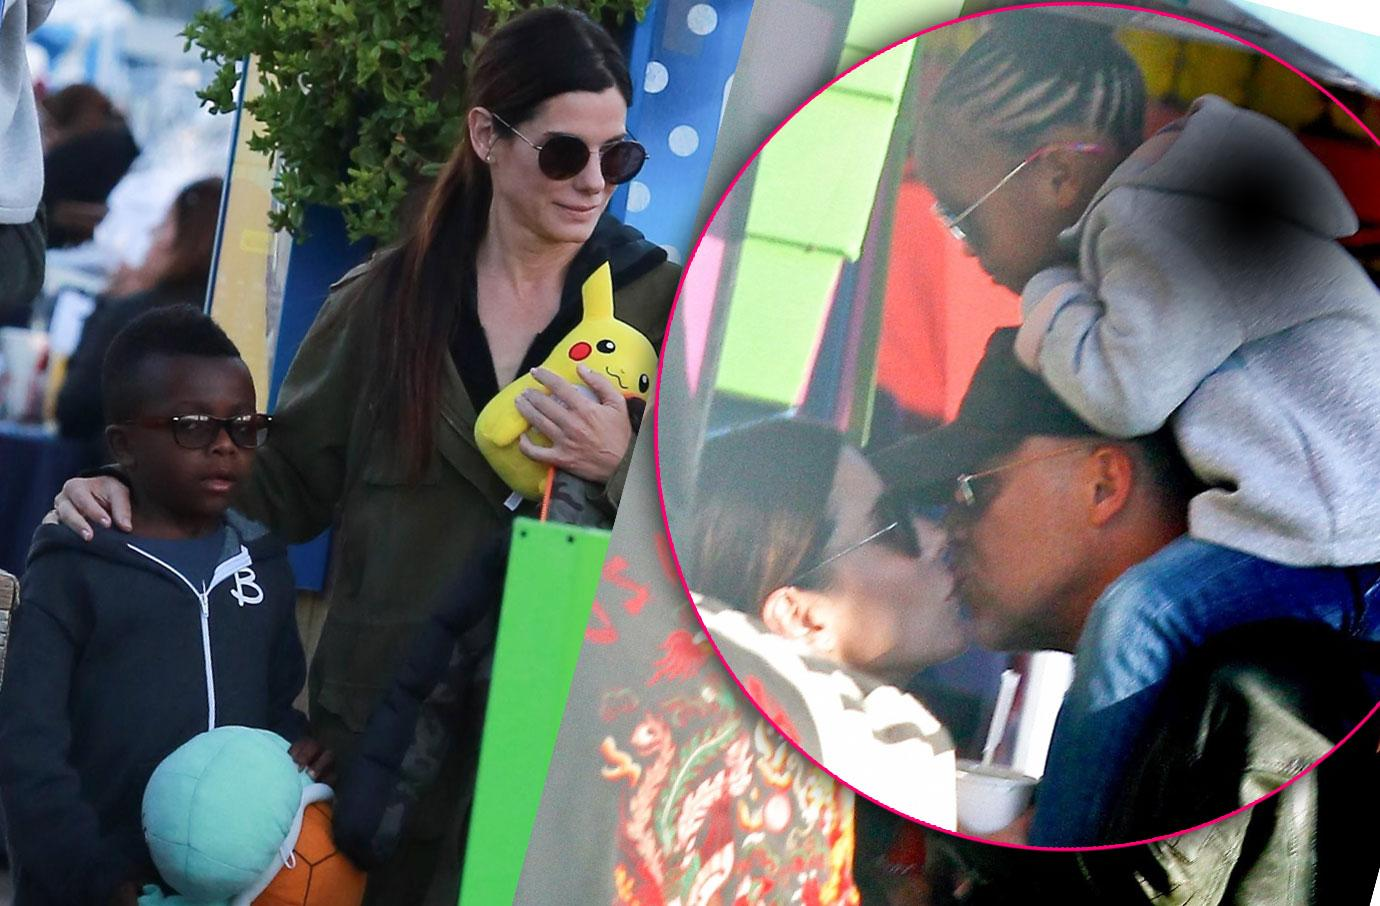 Sandra Bullock Bryan Randall Her Kids Amusement Park Pics